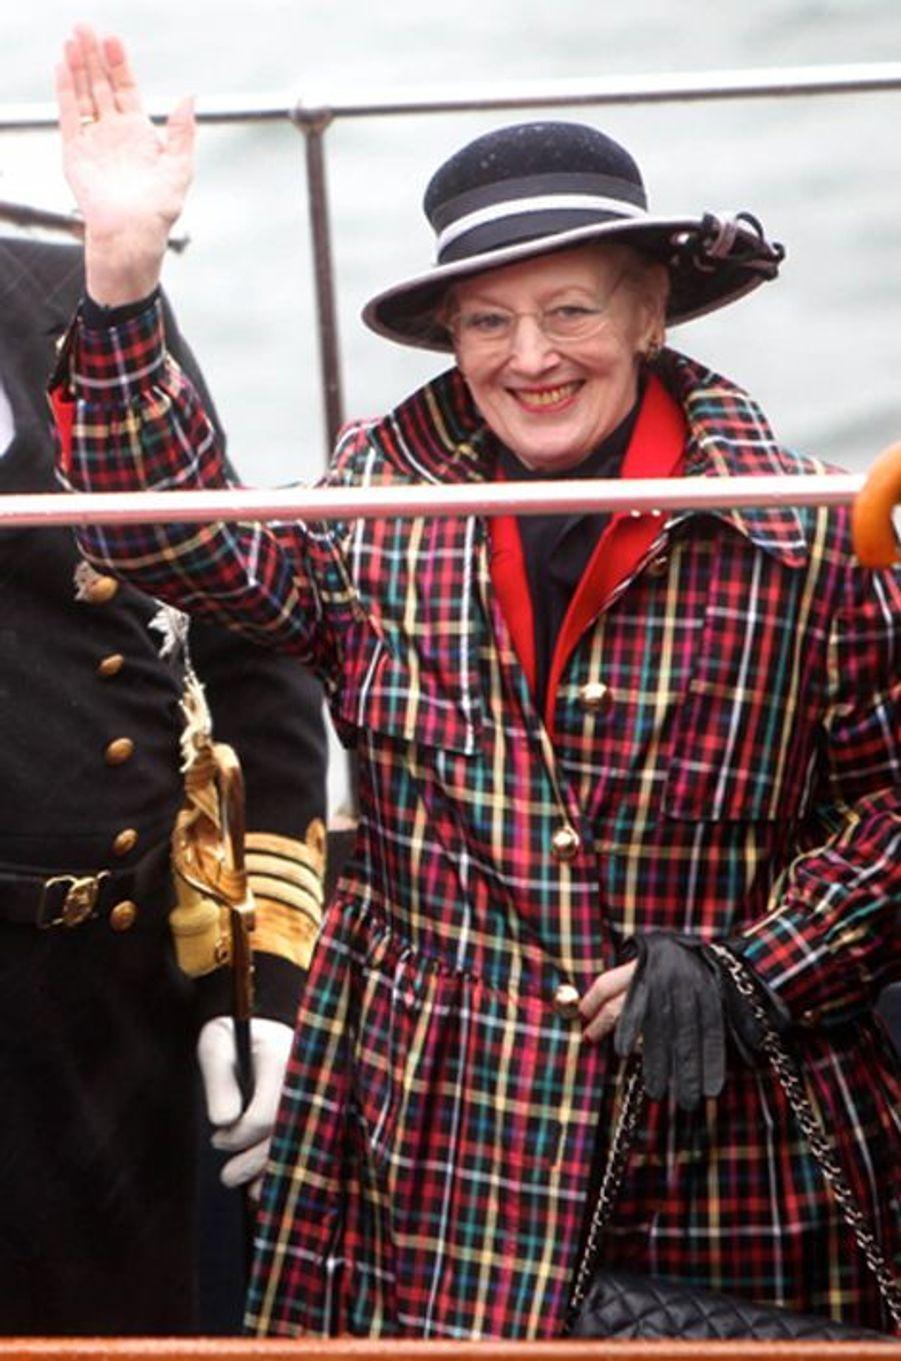 La reine Margrethe II de Danemark, le 5 mai 2015